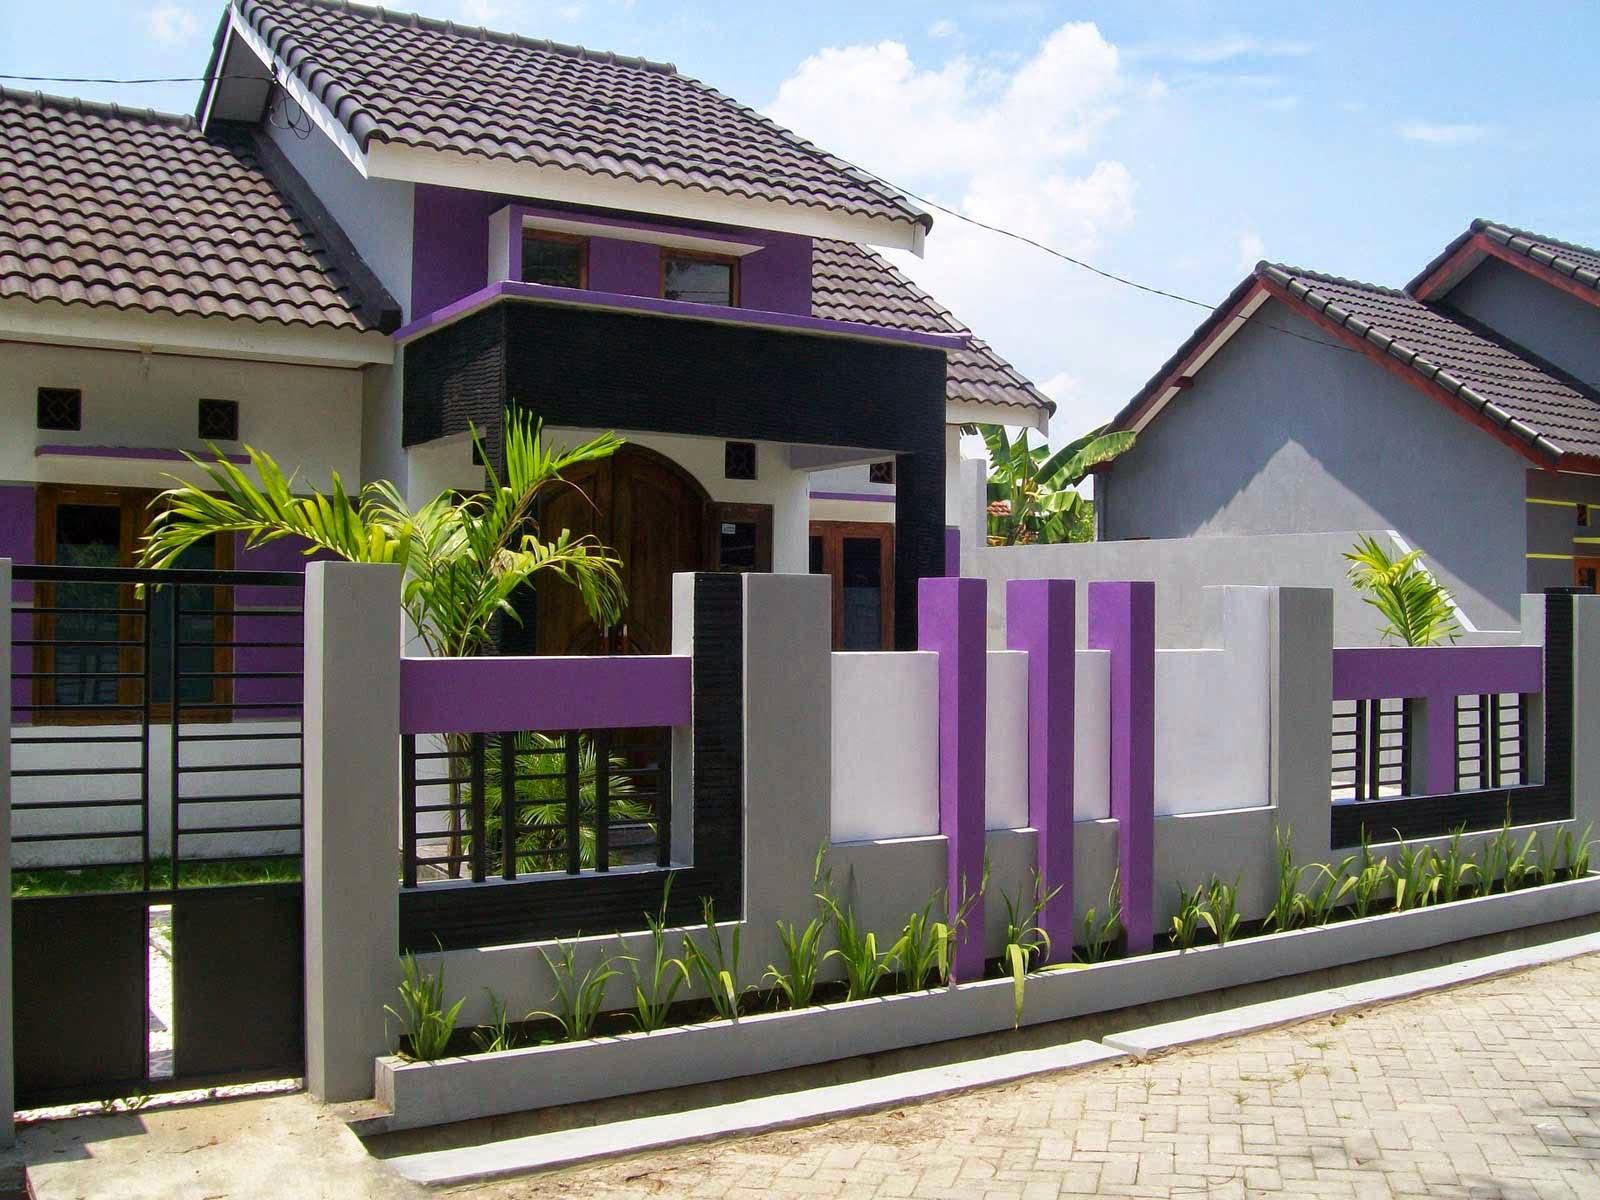 Model-Fence-Minimalist-Home-Color-Purple-Cat